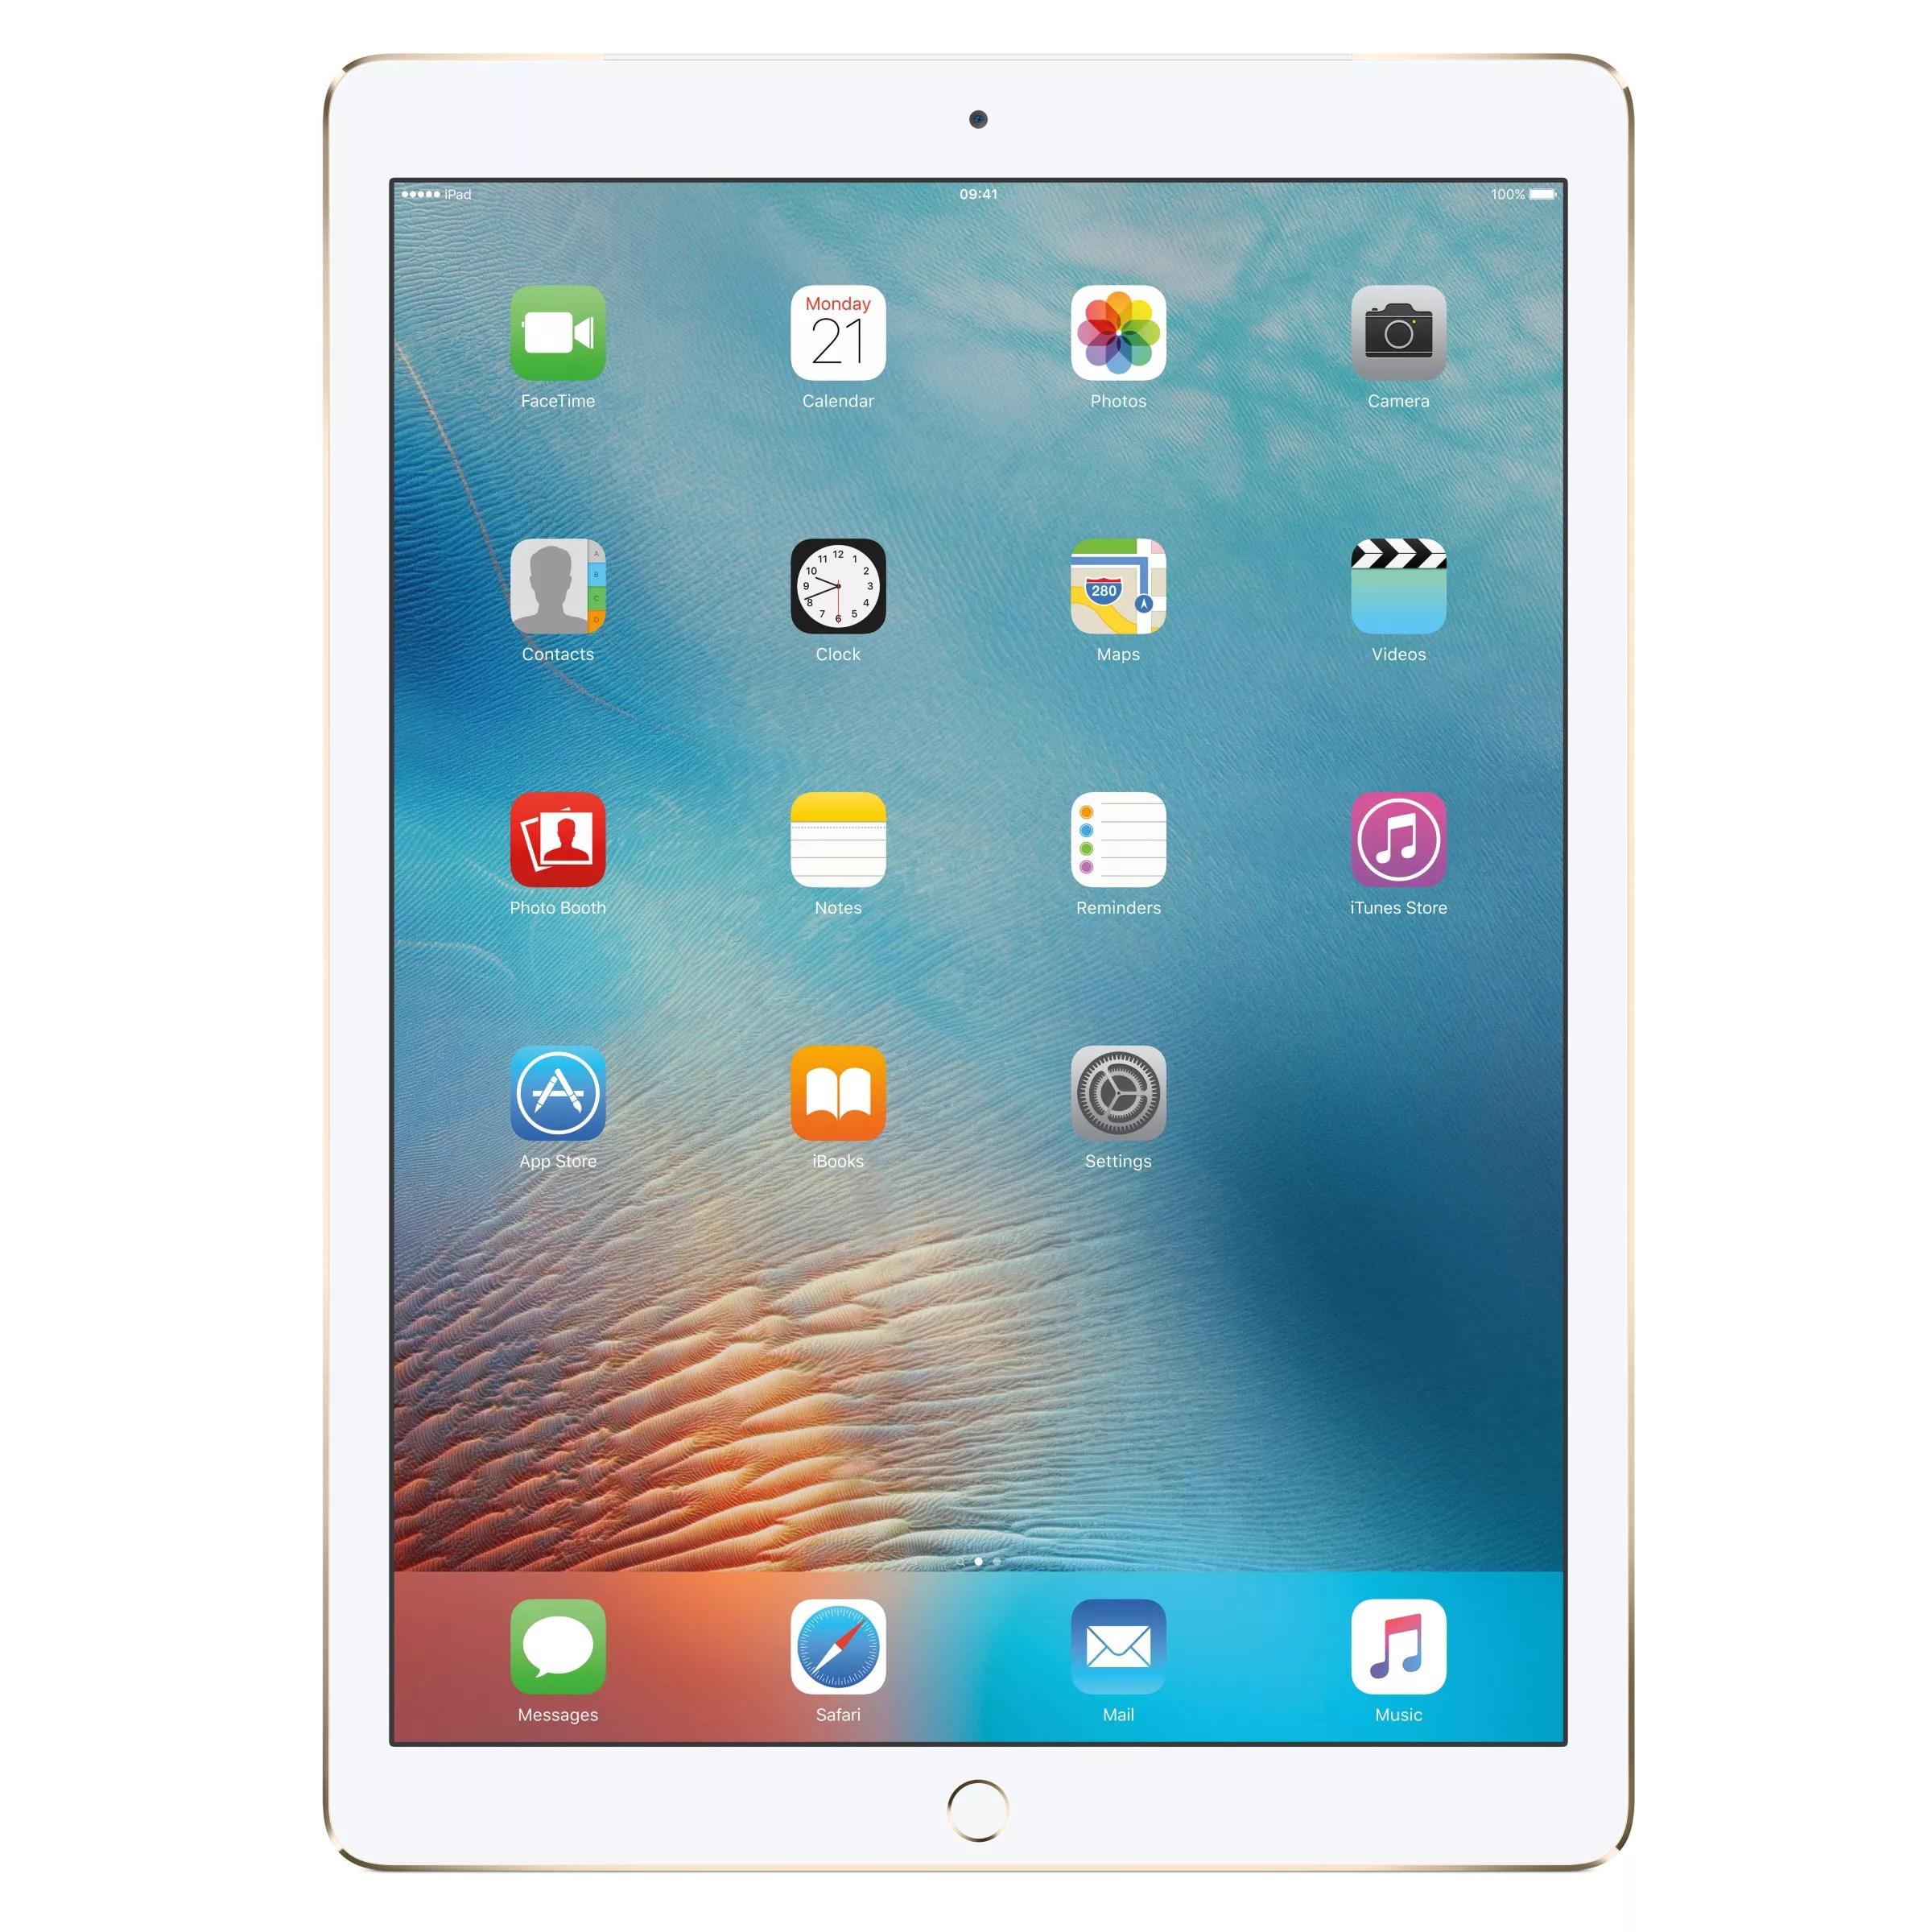 Apple Ipad Pro A9x Ios 12 9 Wi Fi Cellular 256gb